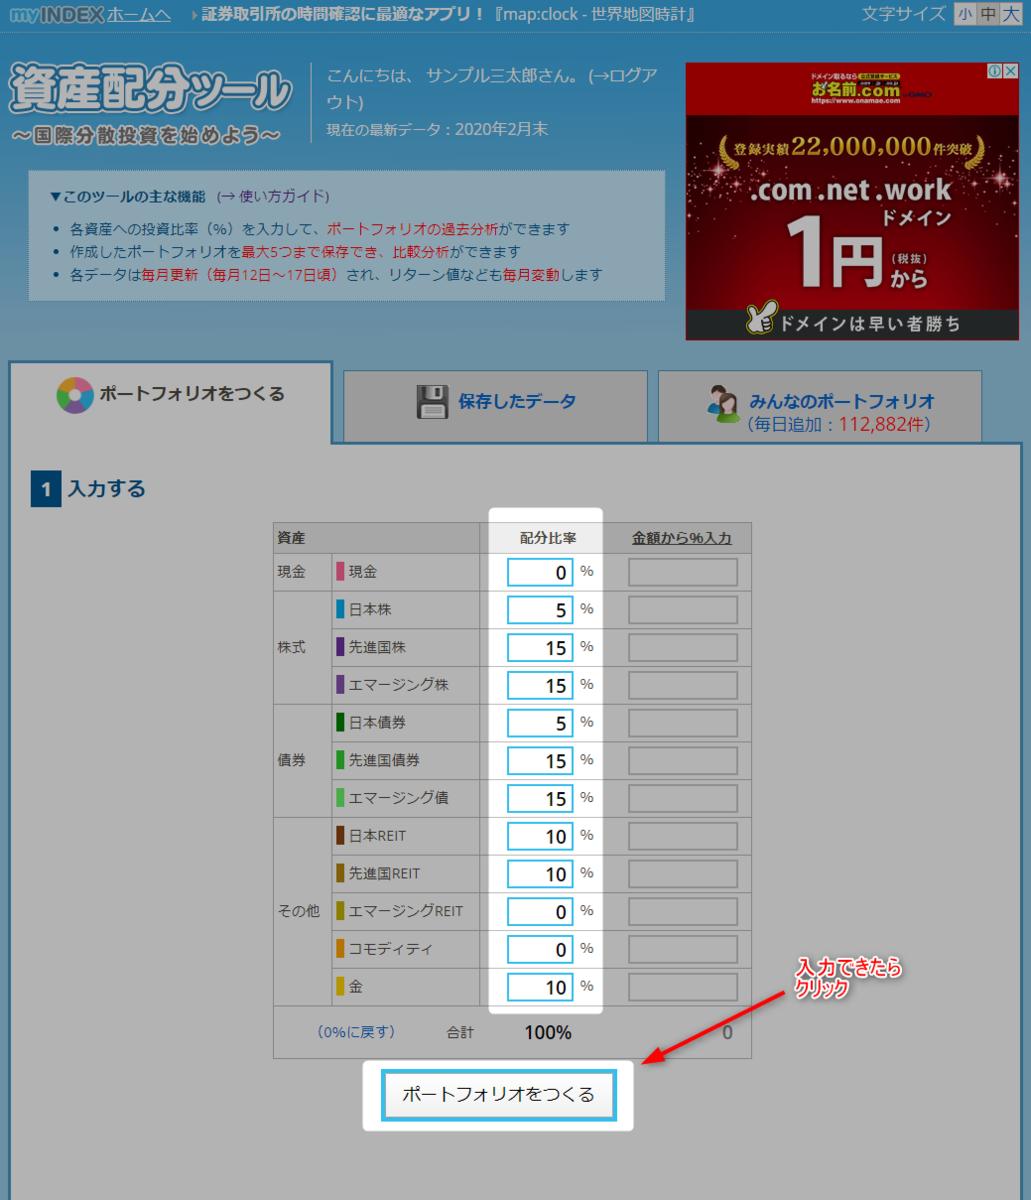 f:id:yau_otogi:20200315200037p:plain